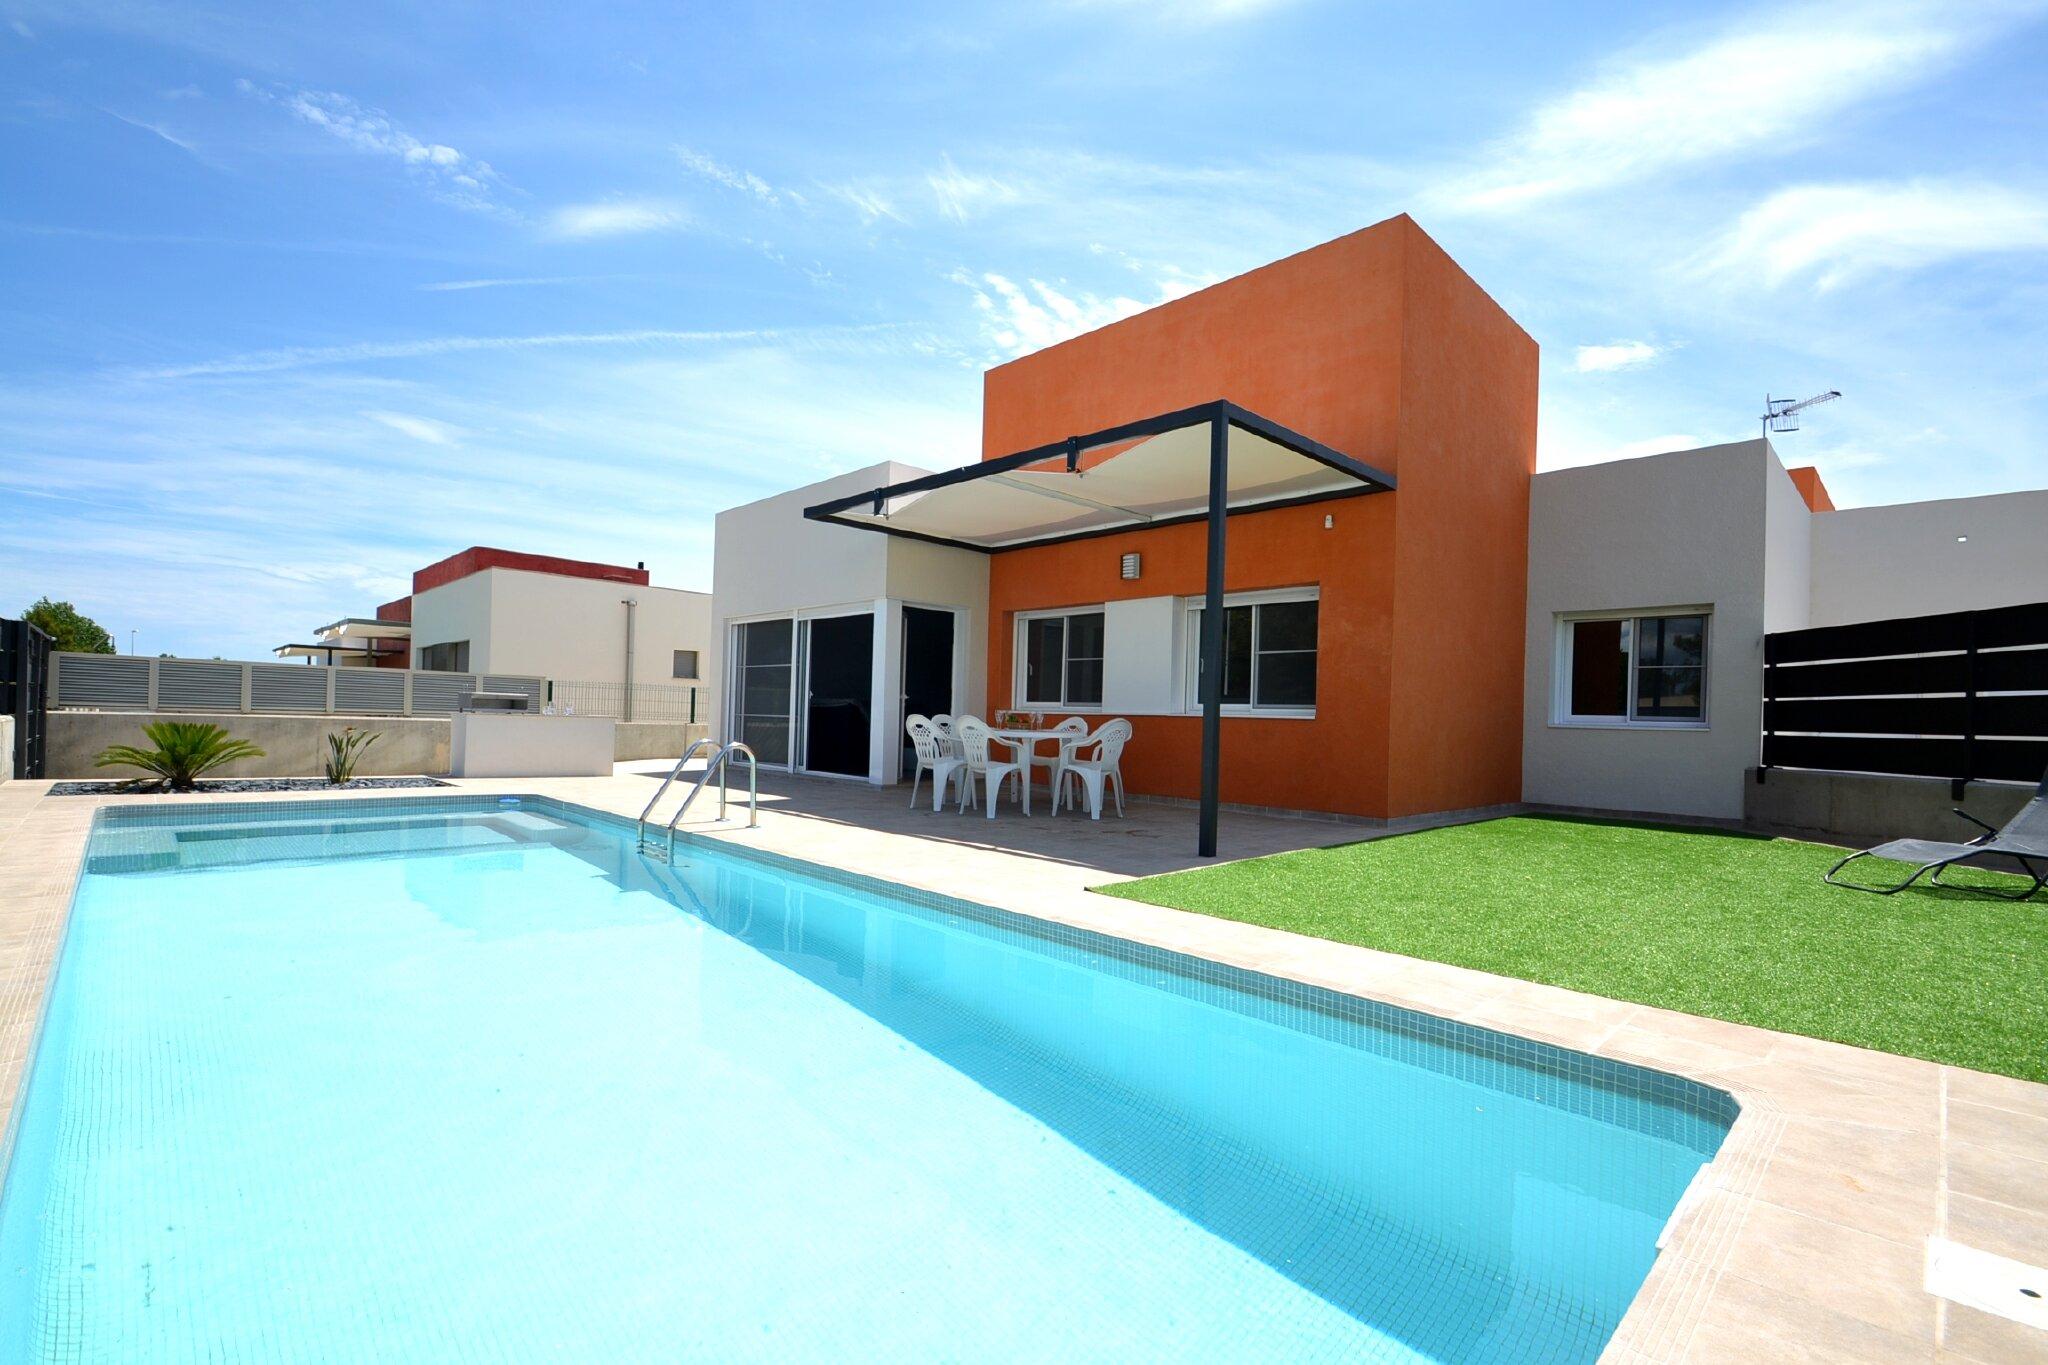 Villa Oasis 300qm mit Blick aufs Meer